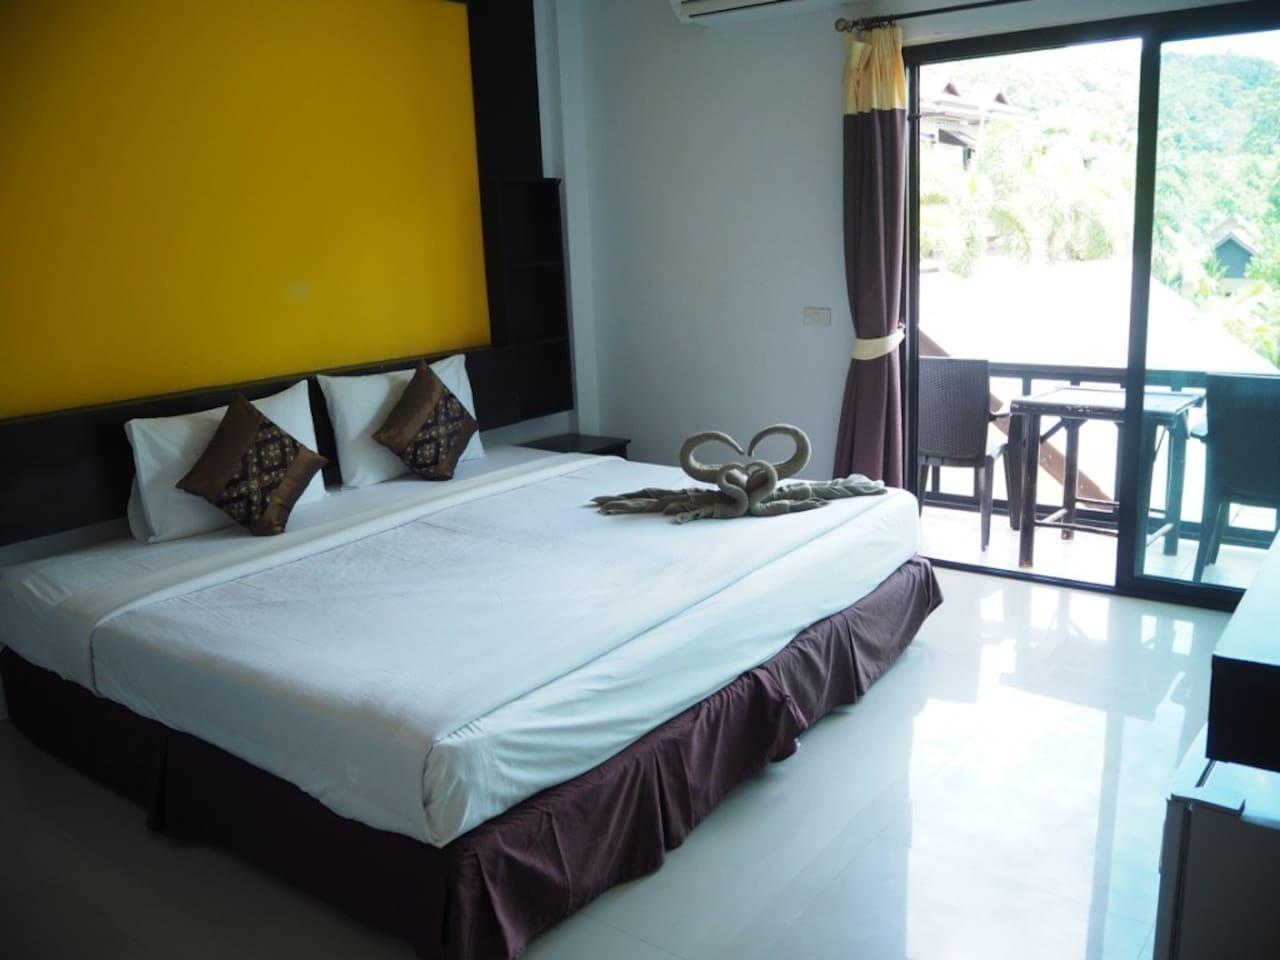 Cosy standard room near beach on Phi Phi วิลลา 1 ห้องนอน 1 ห้องน้ำส่วนตัว ขนาด 80 ตร.ม. – อ่าวต้นไทร